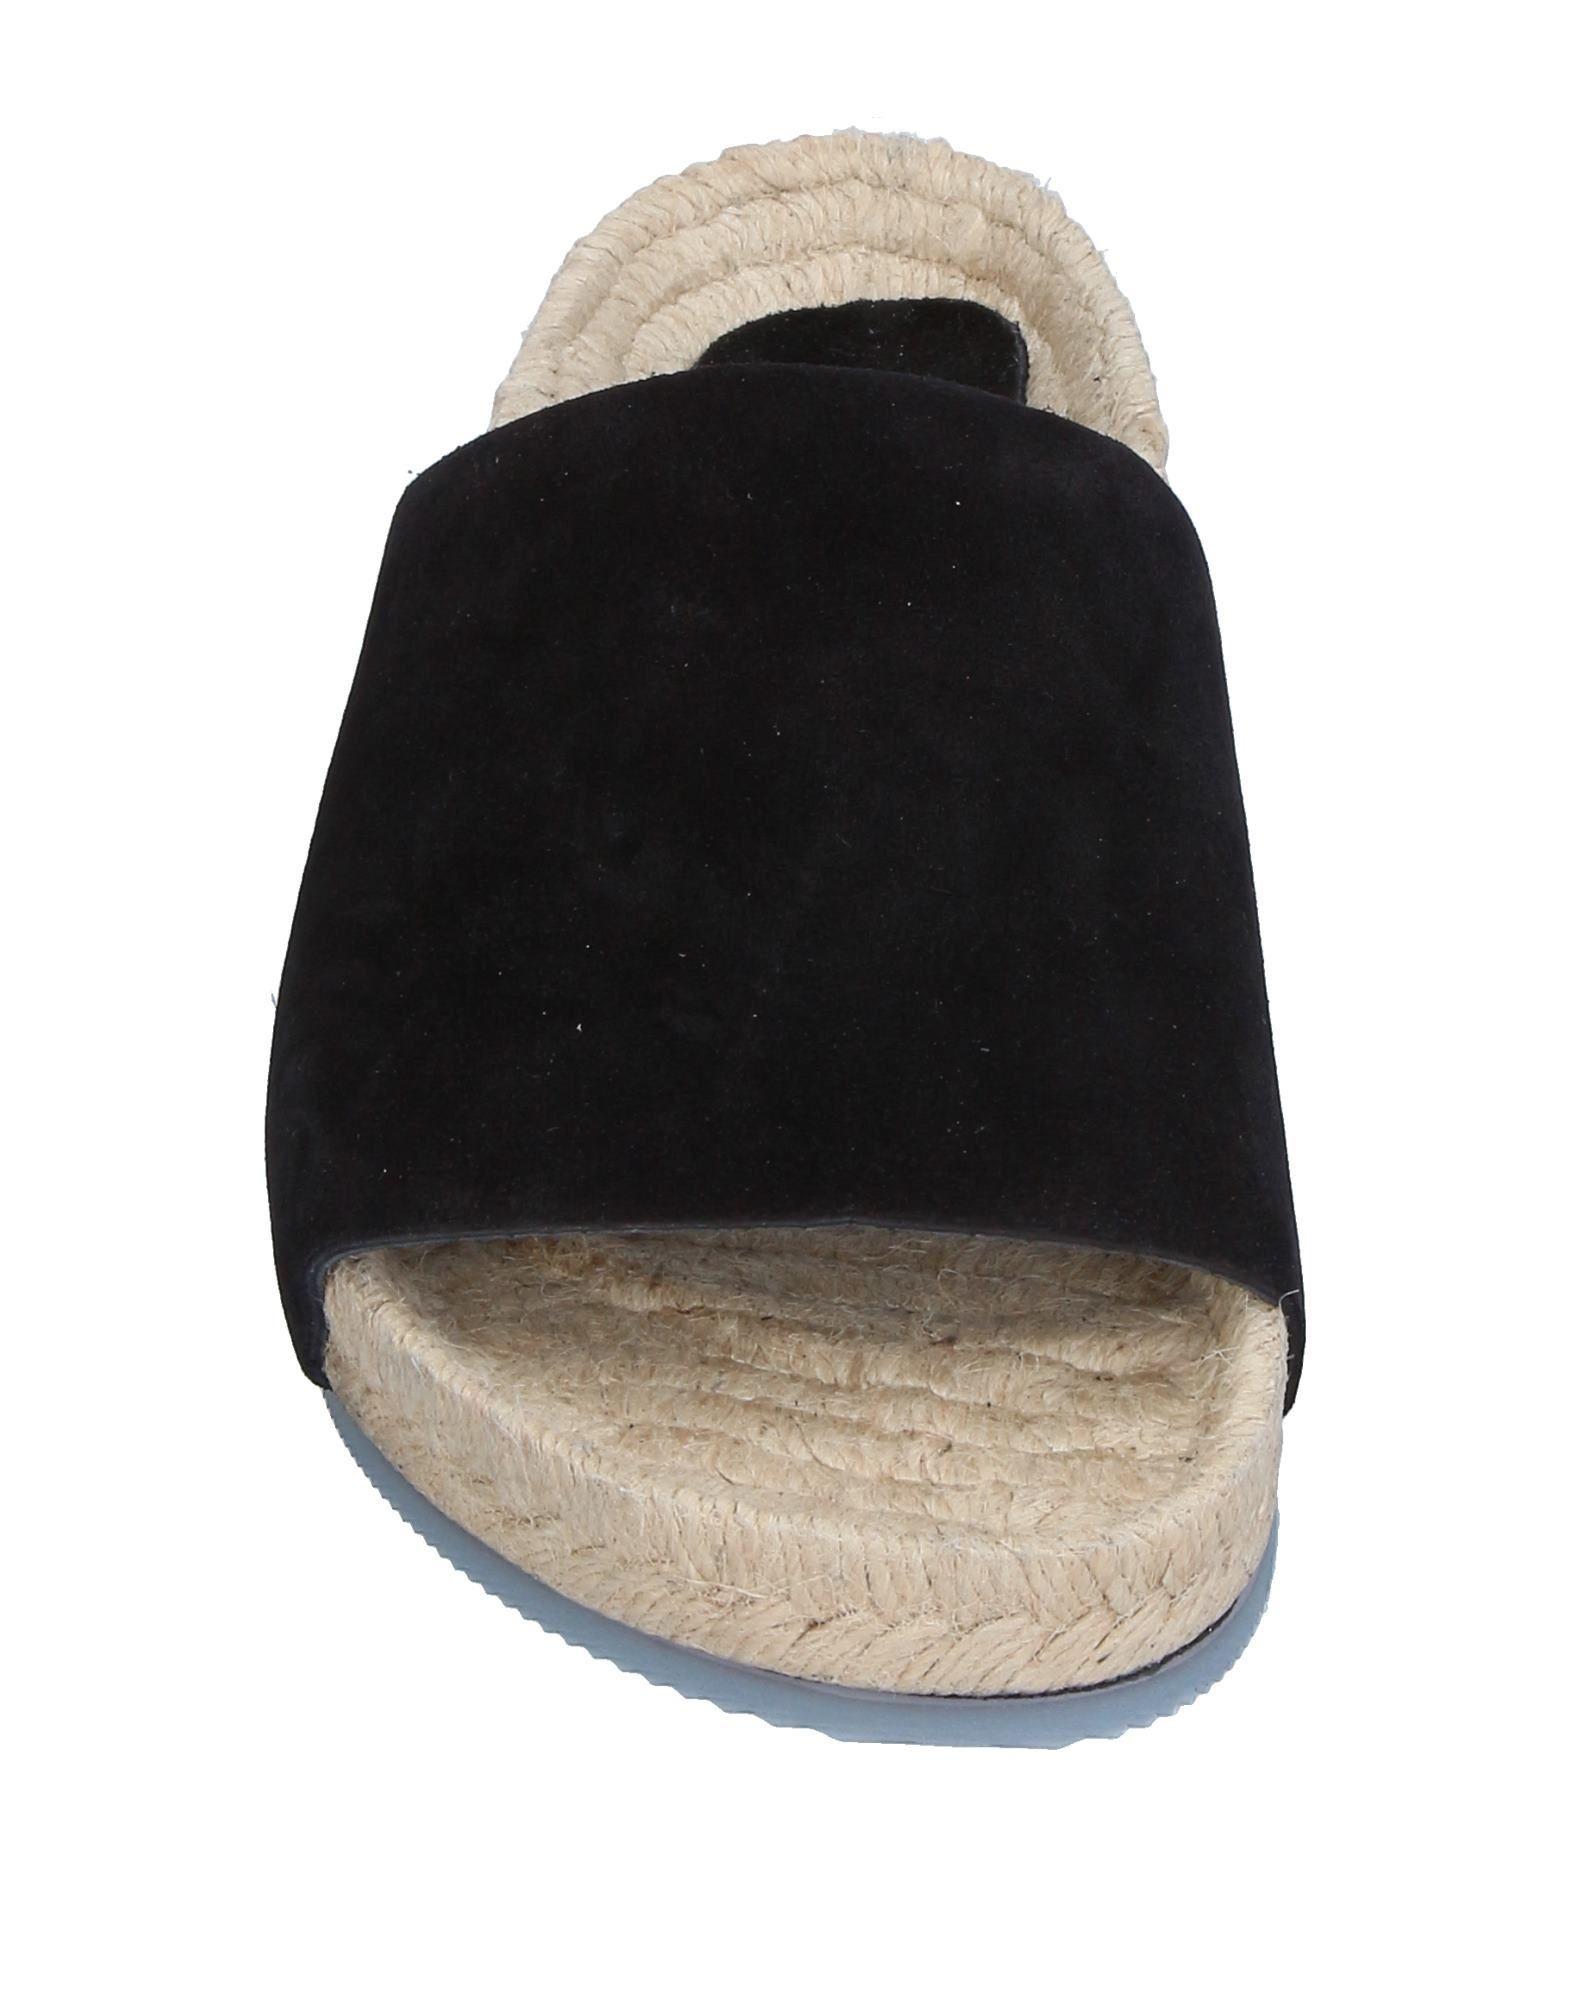 Jeffrey Campbell Black Leather Espadrilles Sliders